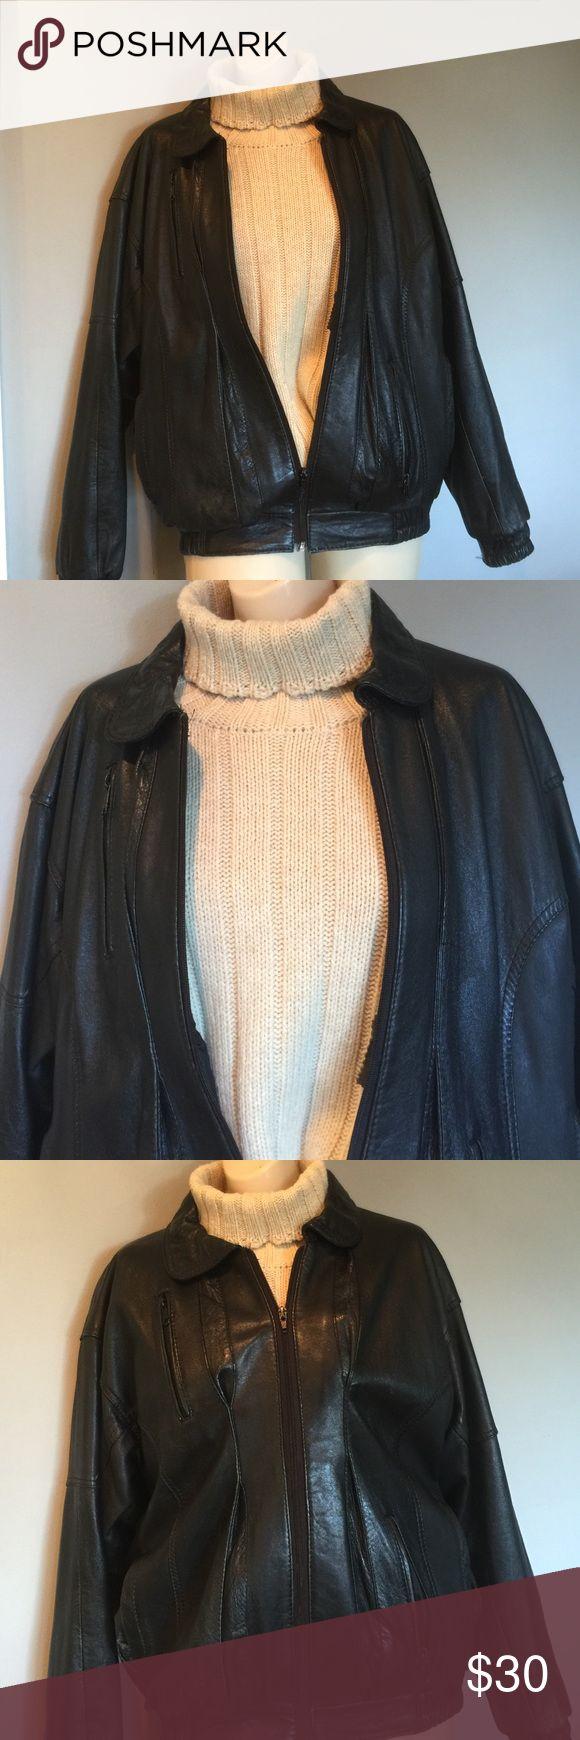 Black Leather Bomber Jacket Very good condition, sz small Wen Jackets & Coats